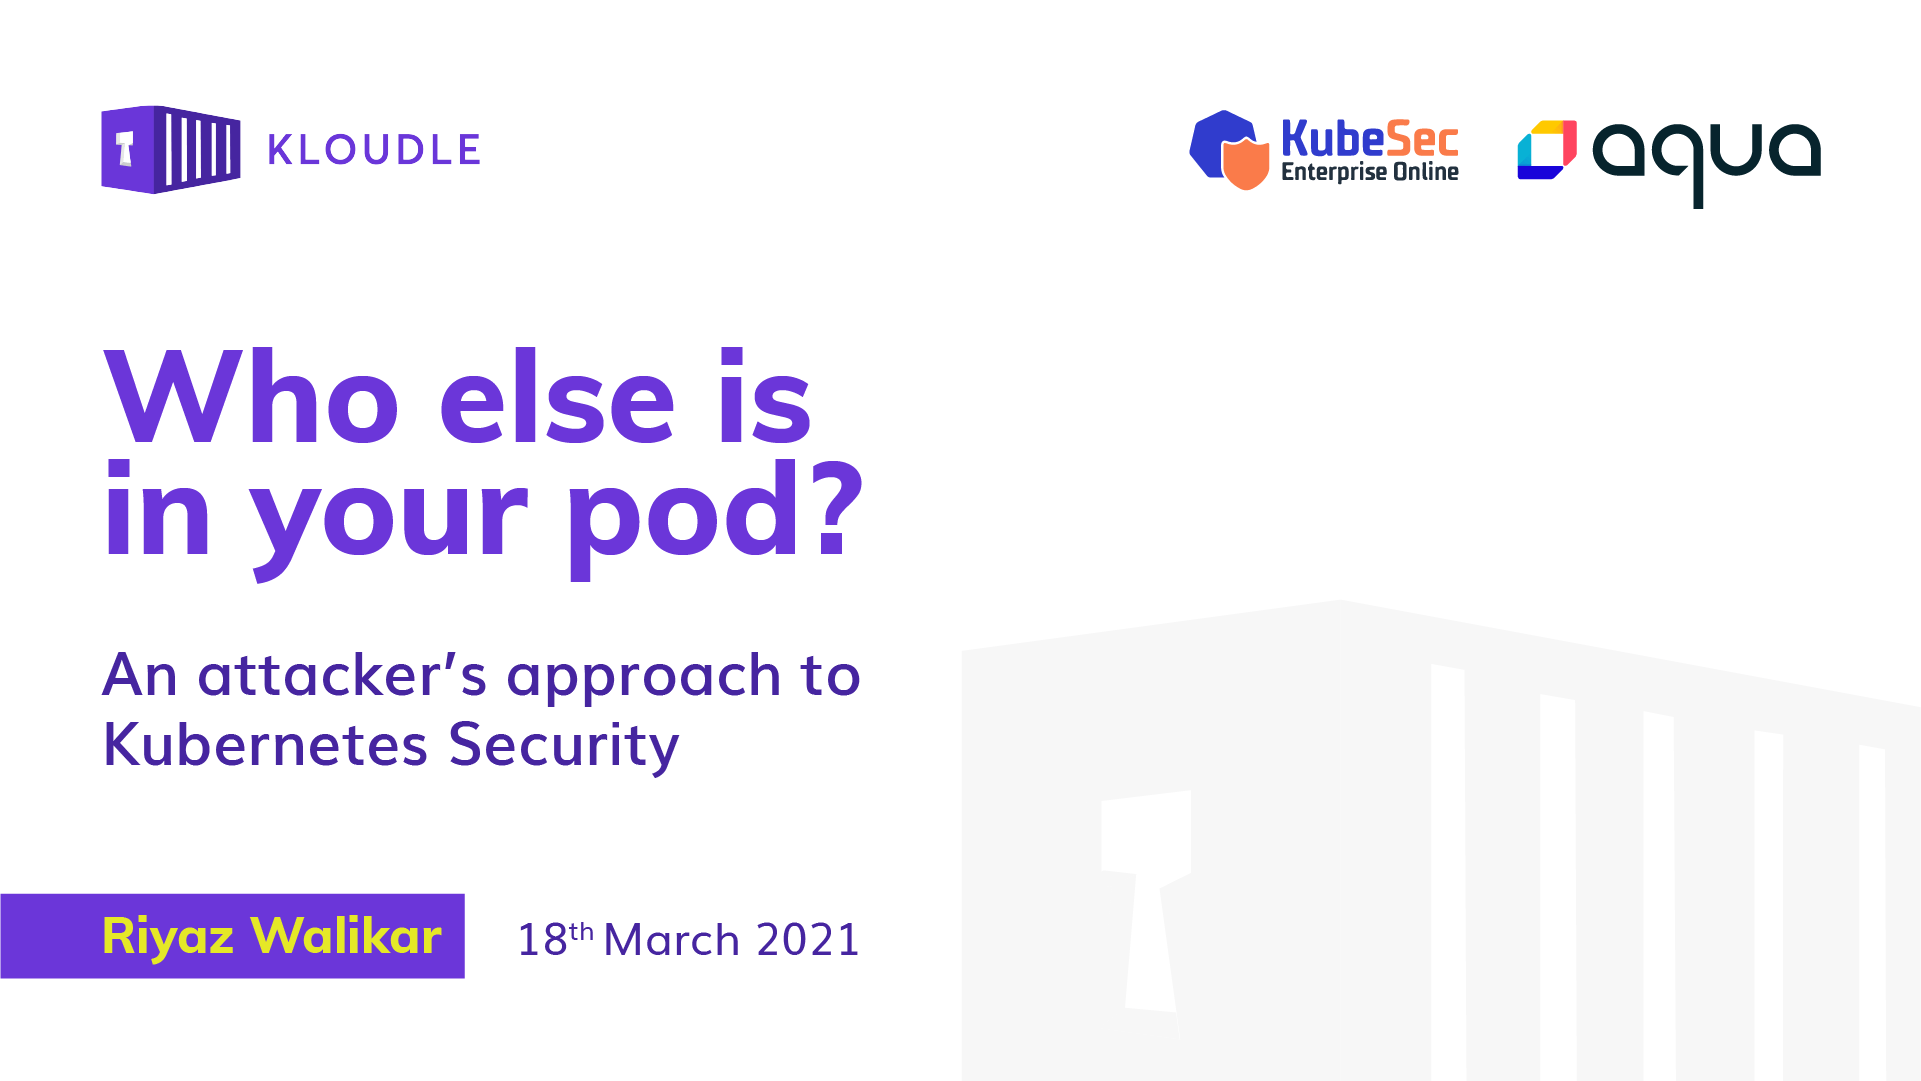 Who else is in your pod? - Walkthrough of the KubeSec Enterprise Online Talk